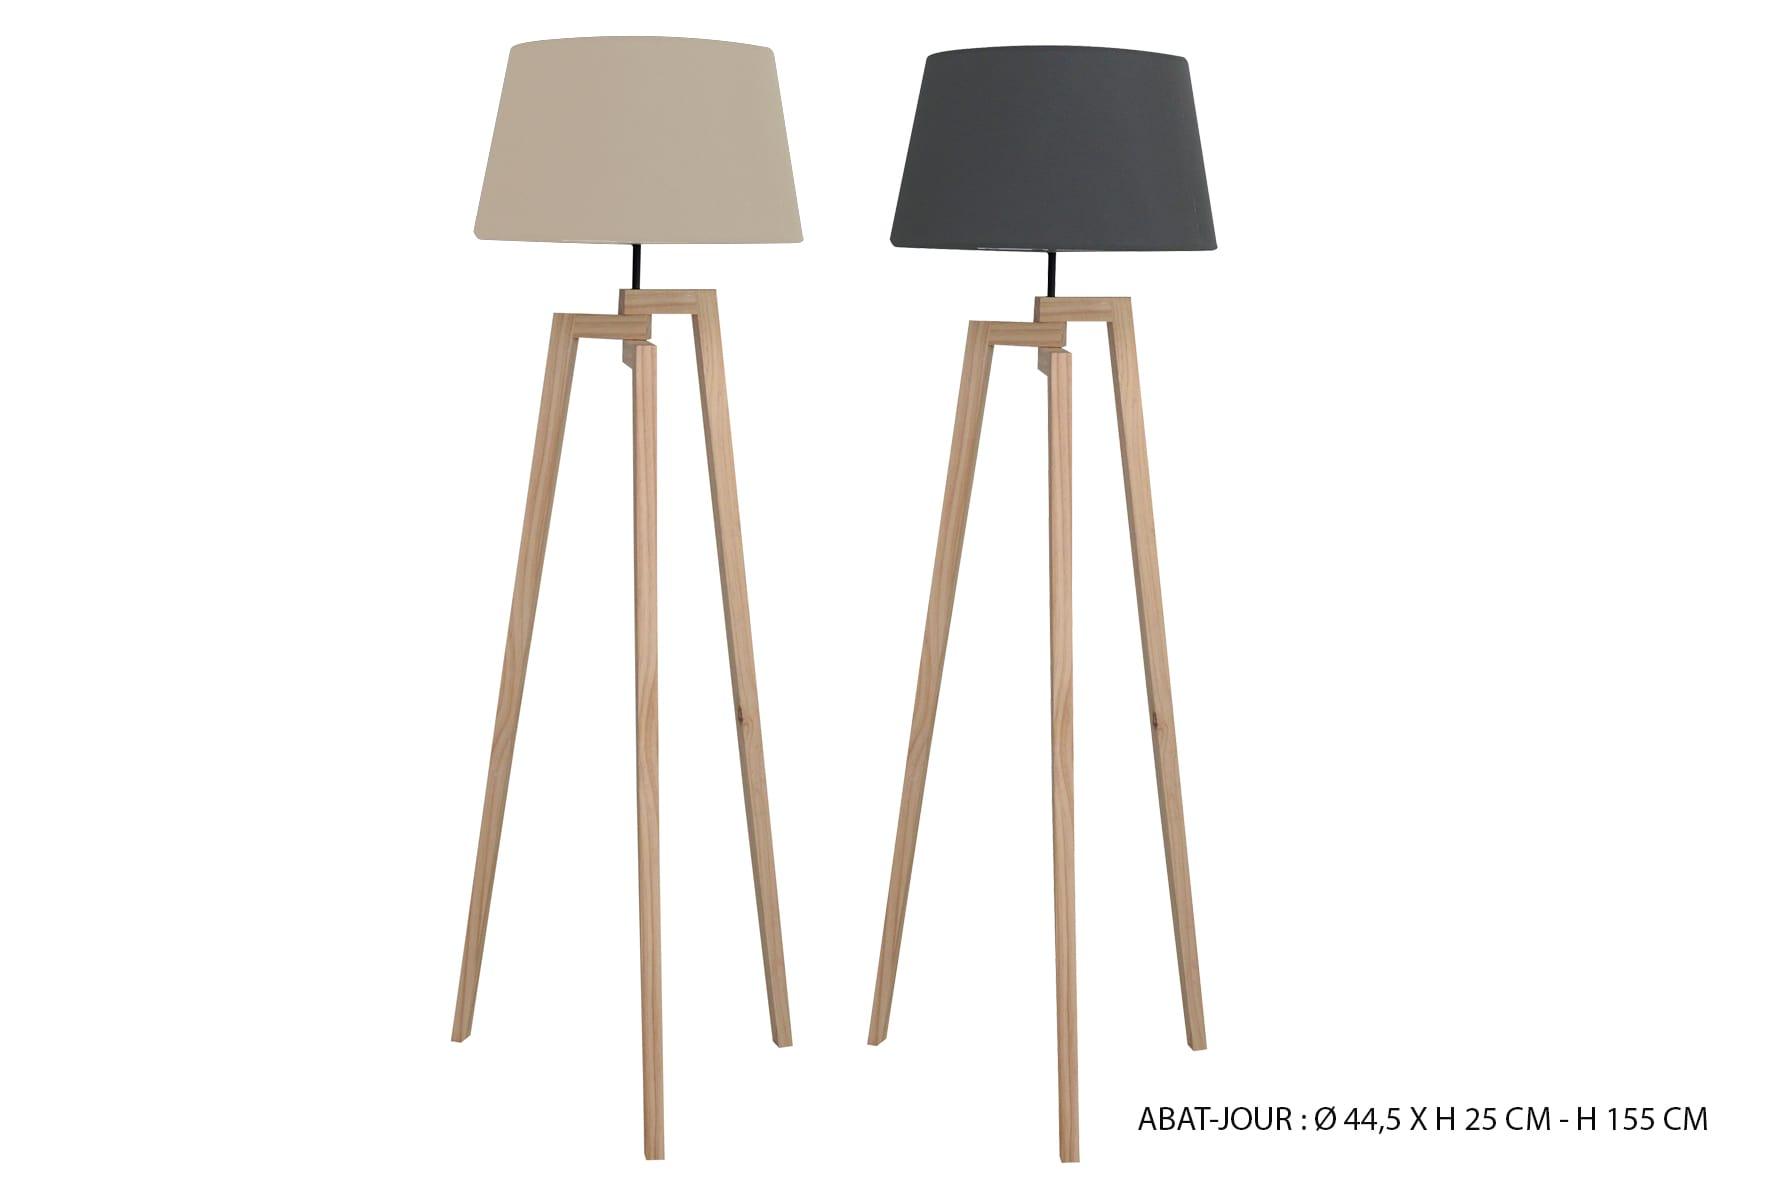 Lampada Abatjour Altezza 155 Cm | LGV Shopping